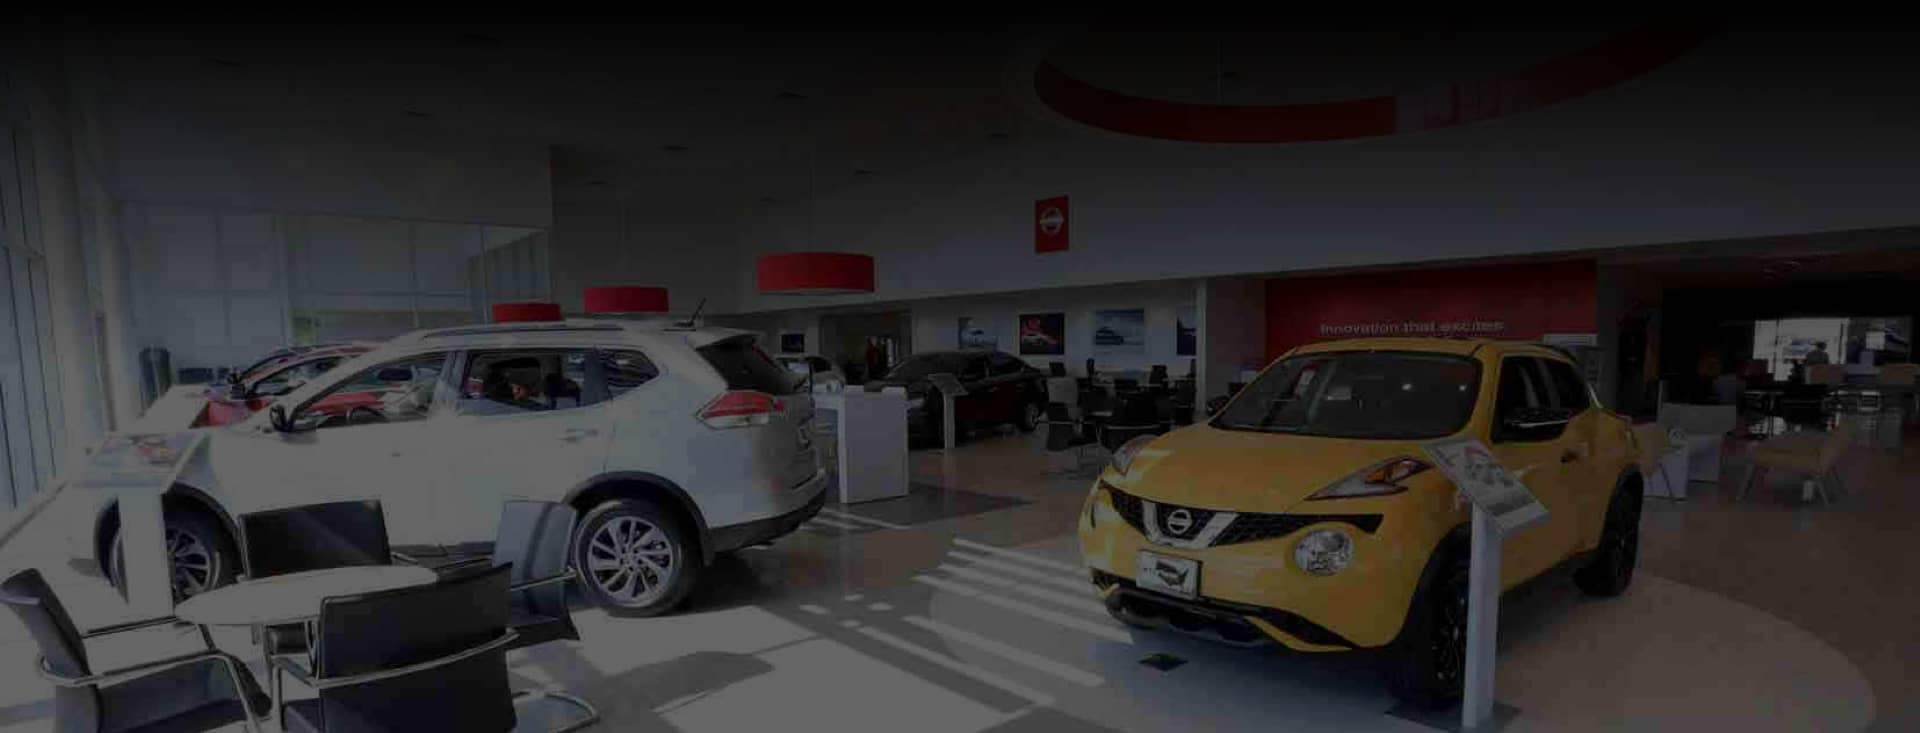 Courtesy Nissan dealership showroom